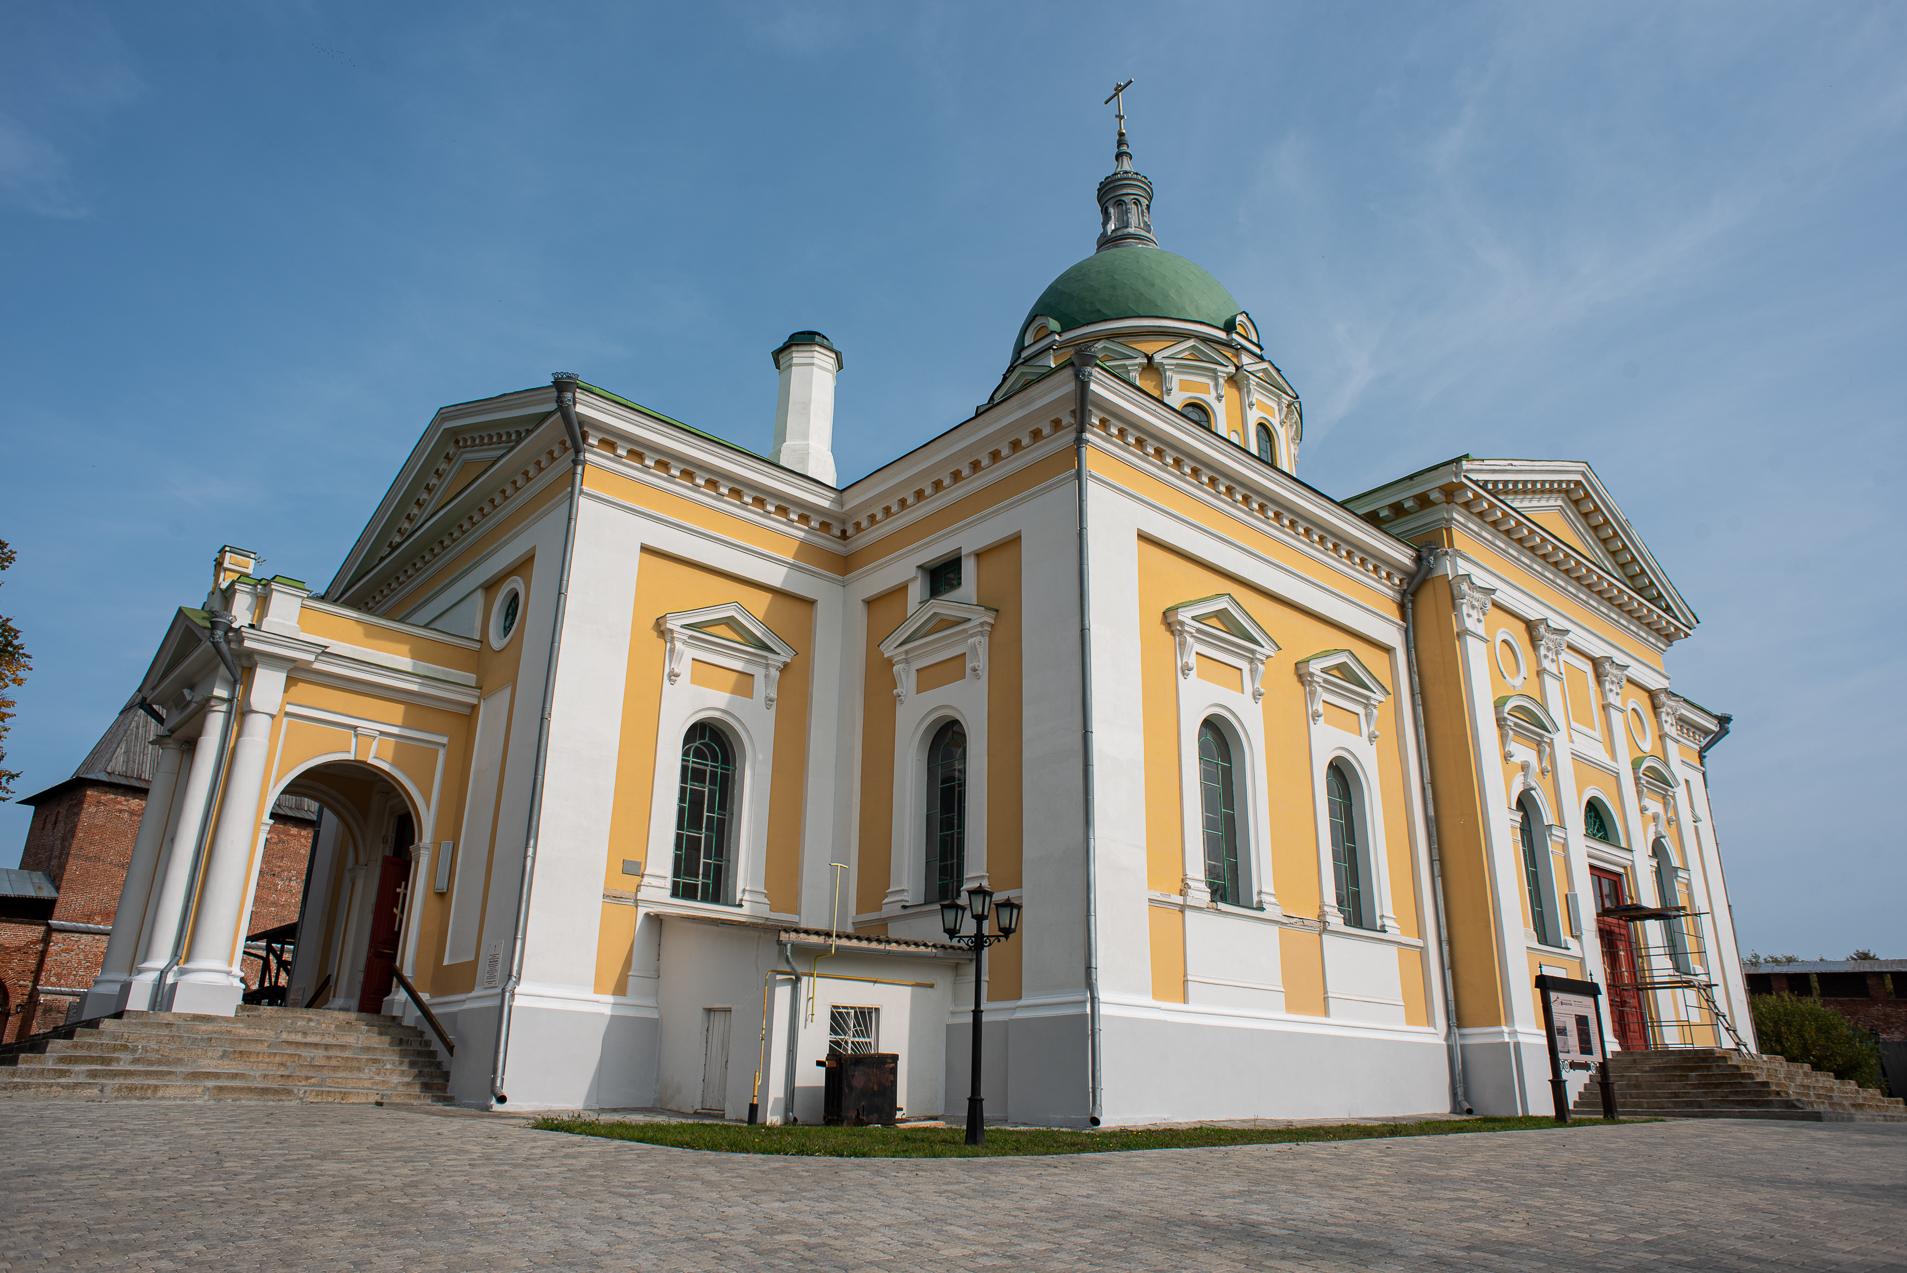 Зарайский кремль, Собор Николая Чудотворца